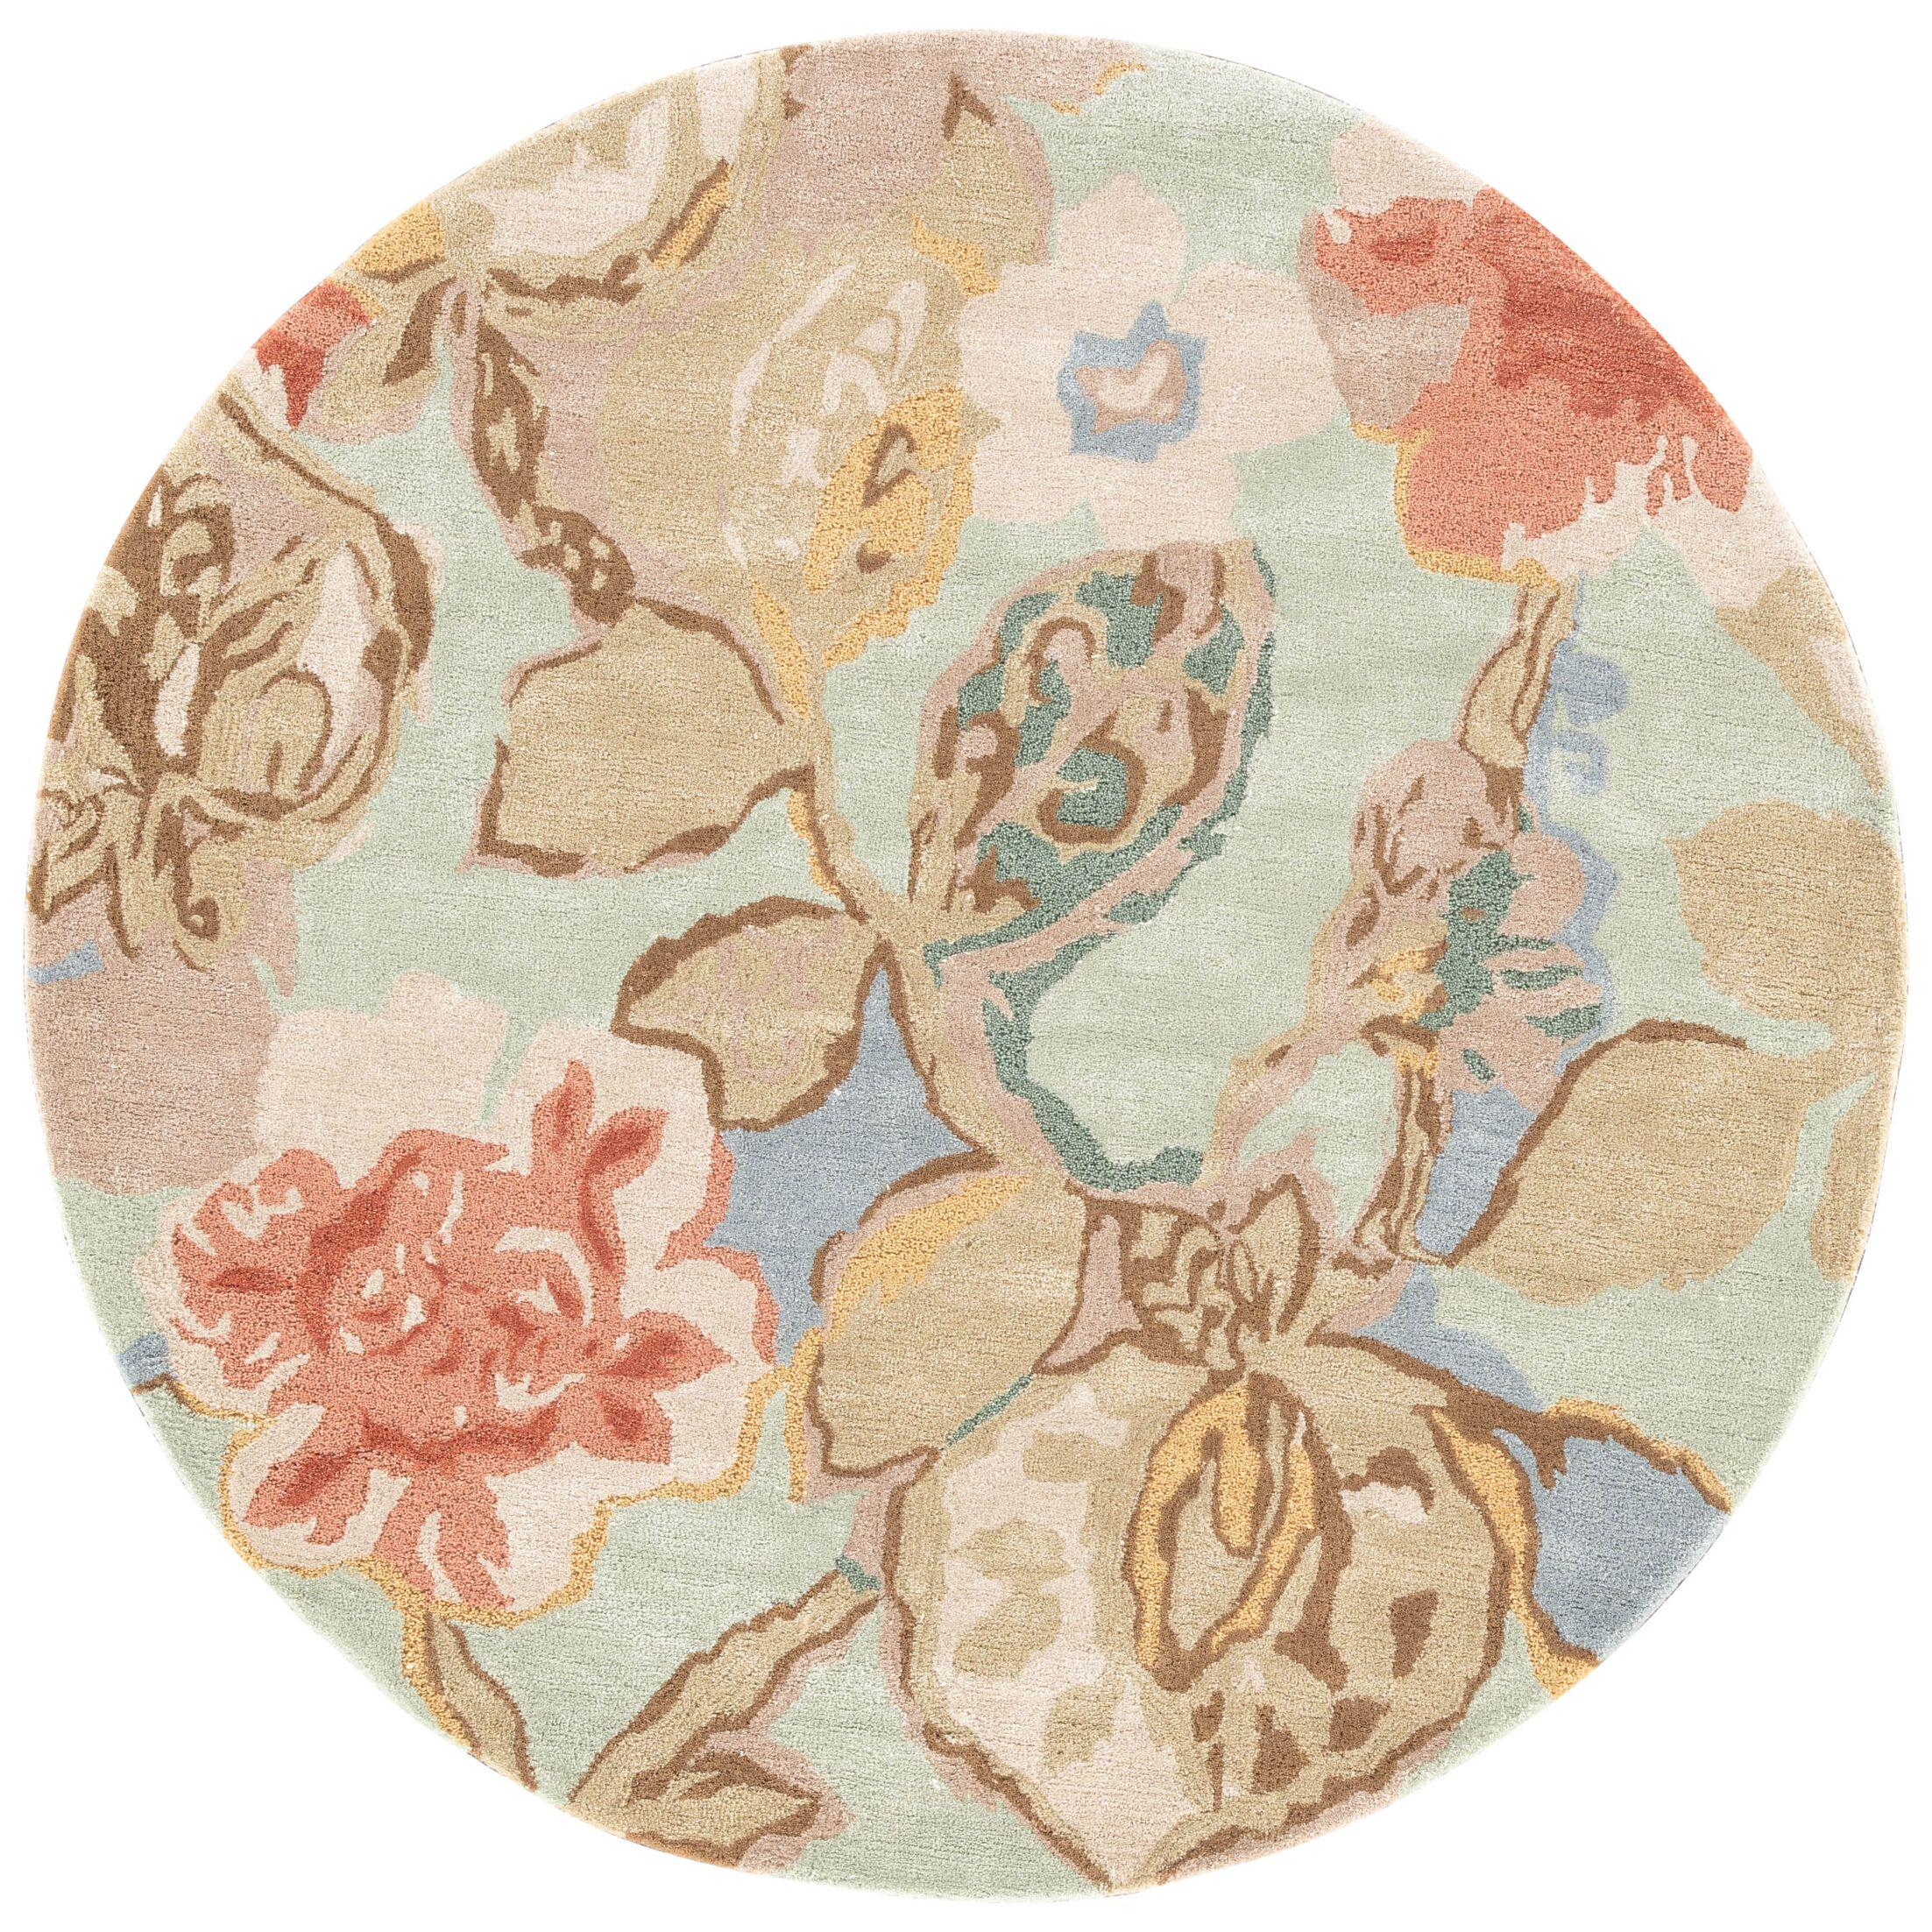 Willette Aqua Foam Floral Area Rug Rug Size: Round 8'